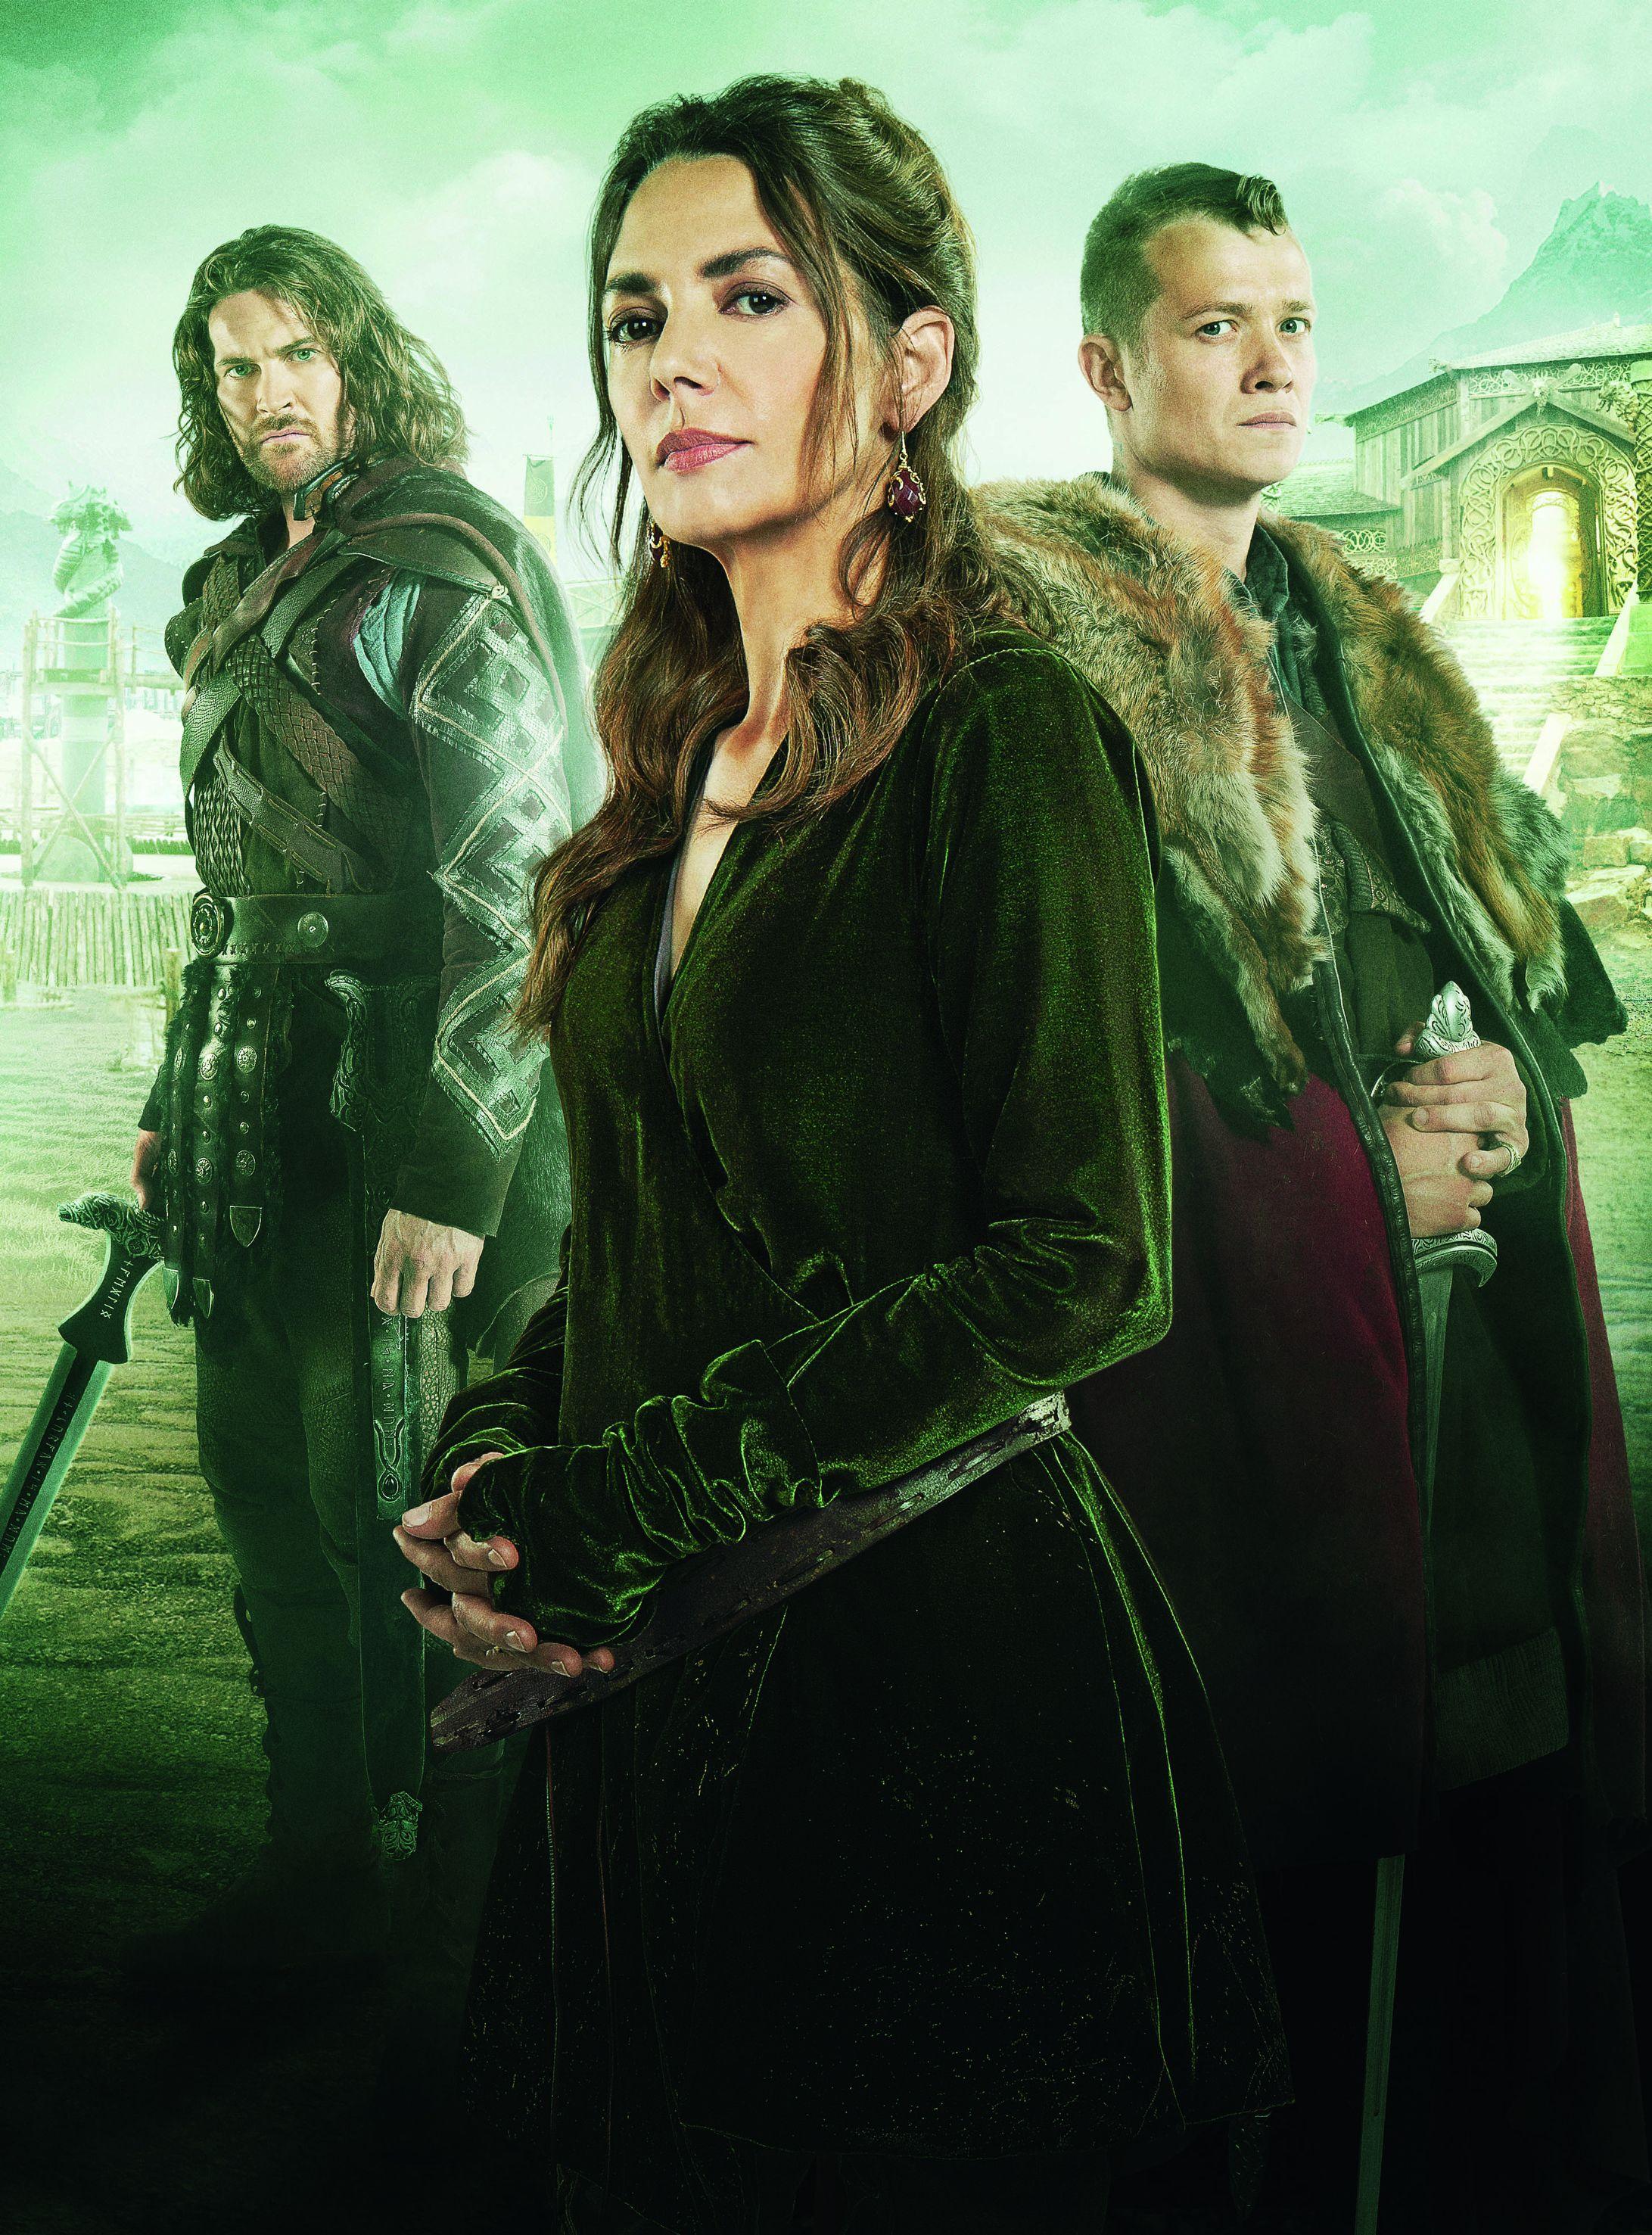 Beowulf - Return to the Shieldlands - Rheda